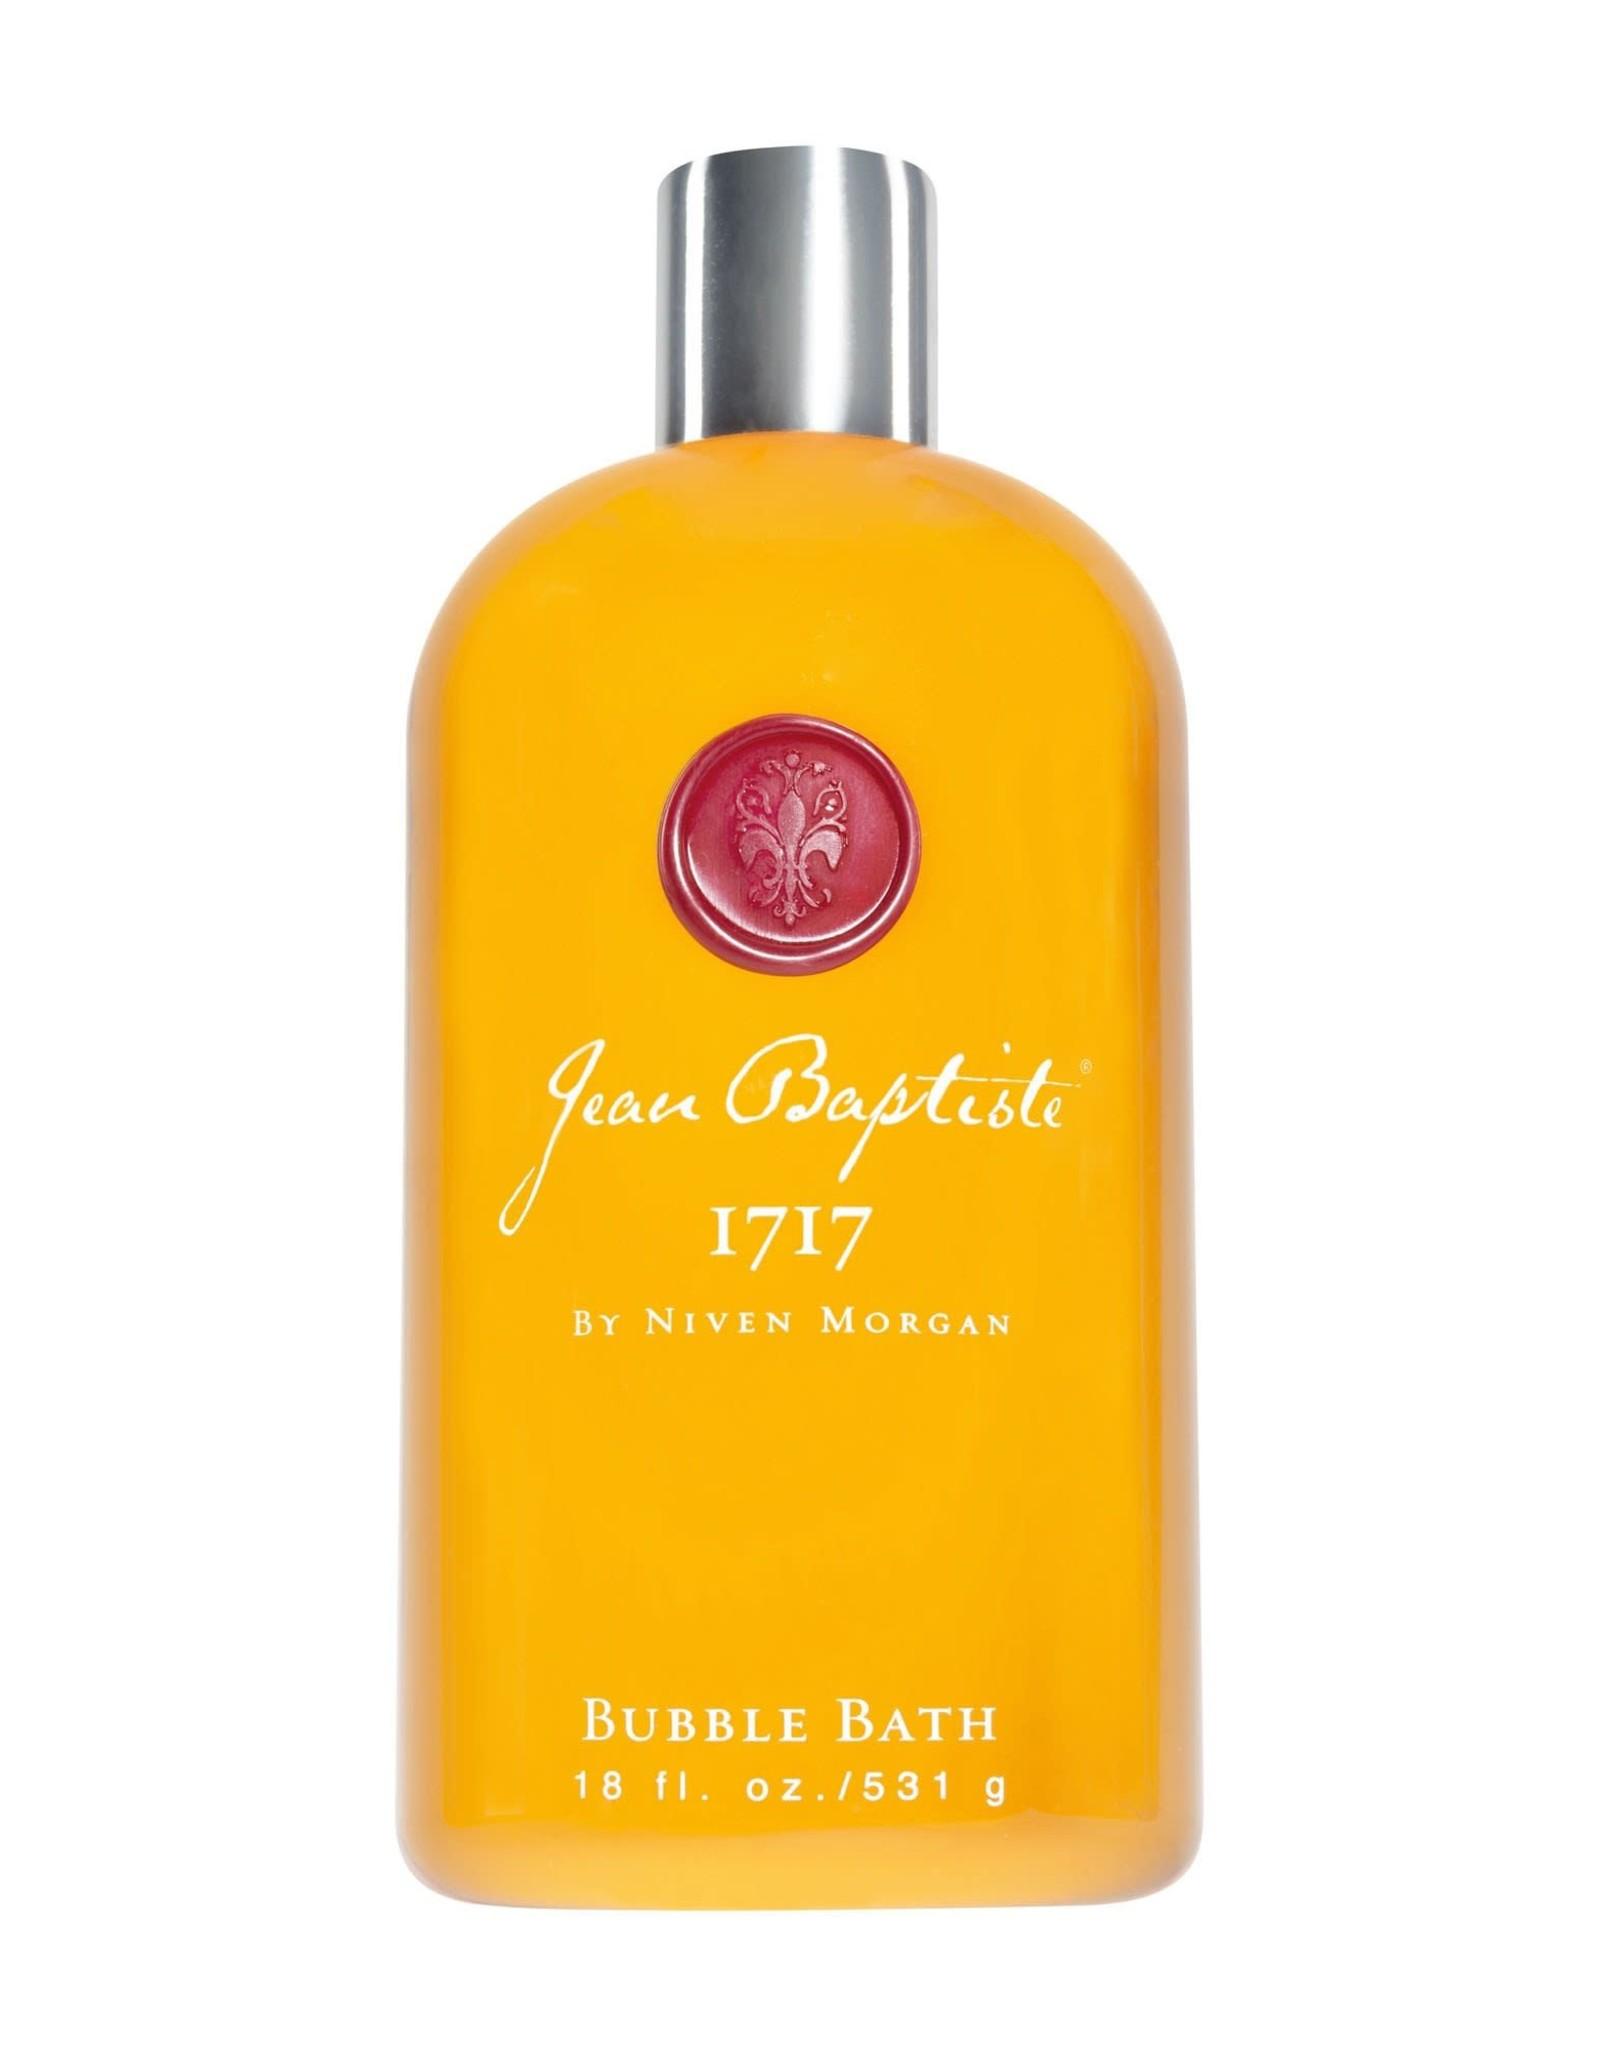 Niven Morgan Jean Baptiste 1717 Bubble Bath